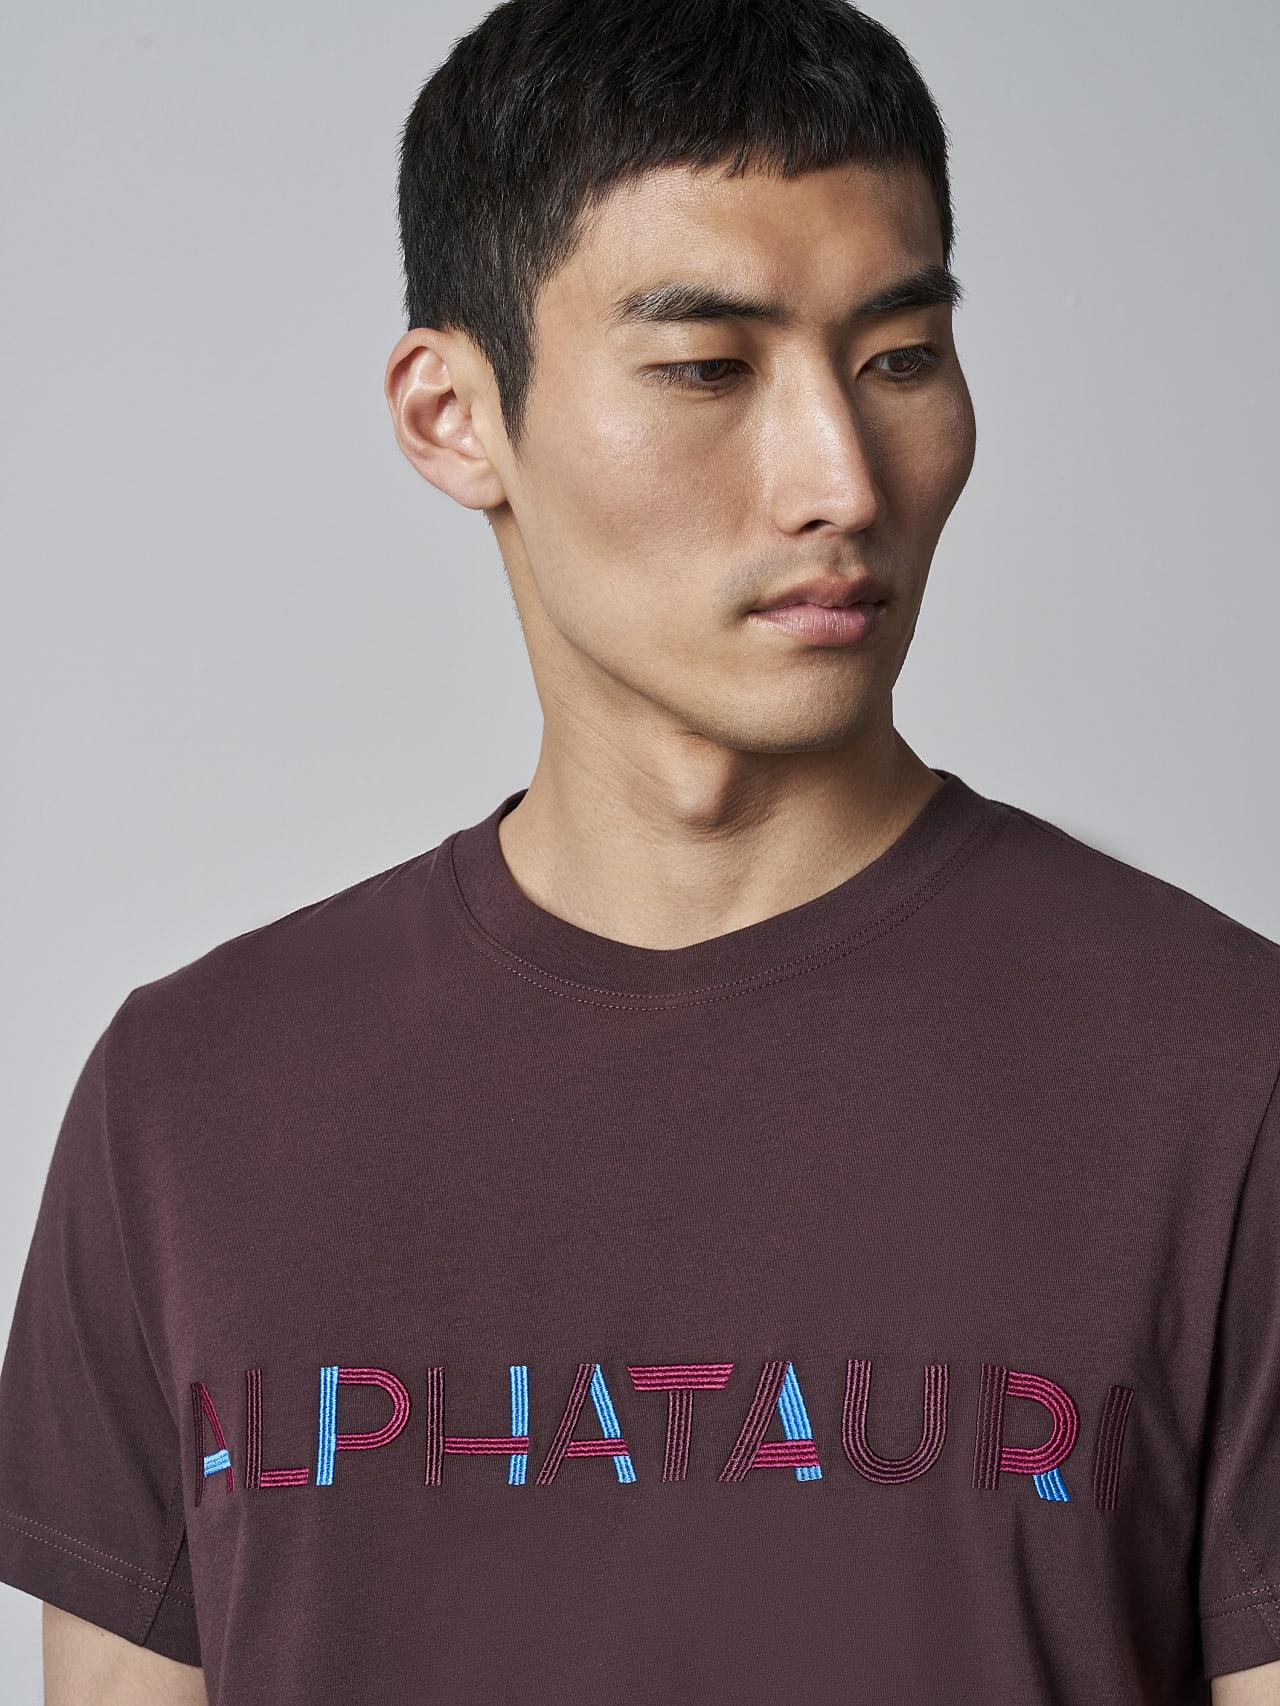 JANOS V3.Y5.02 Logo Embroidery T-Shirt Burgundy Model shot Alpha Tauri